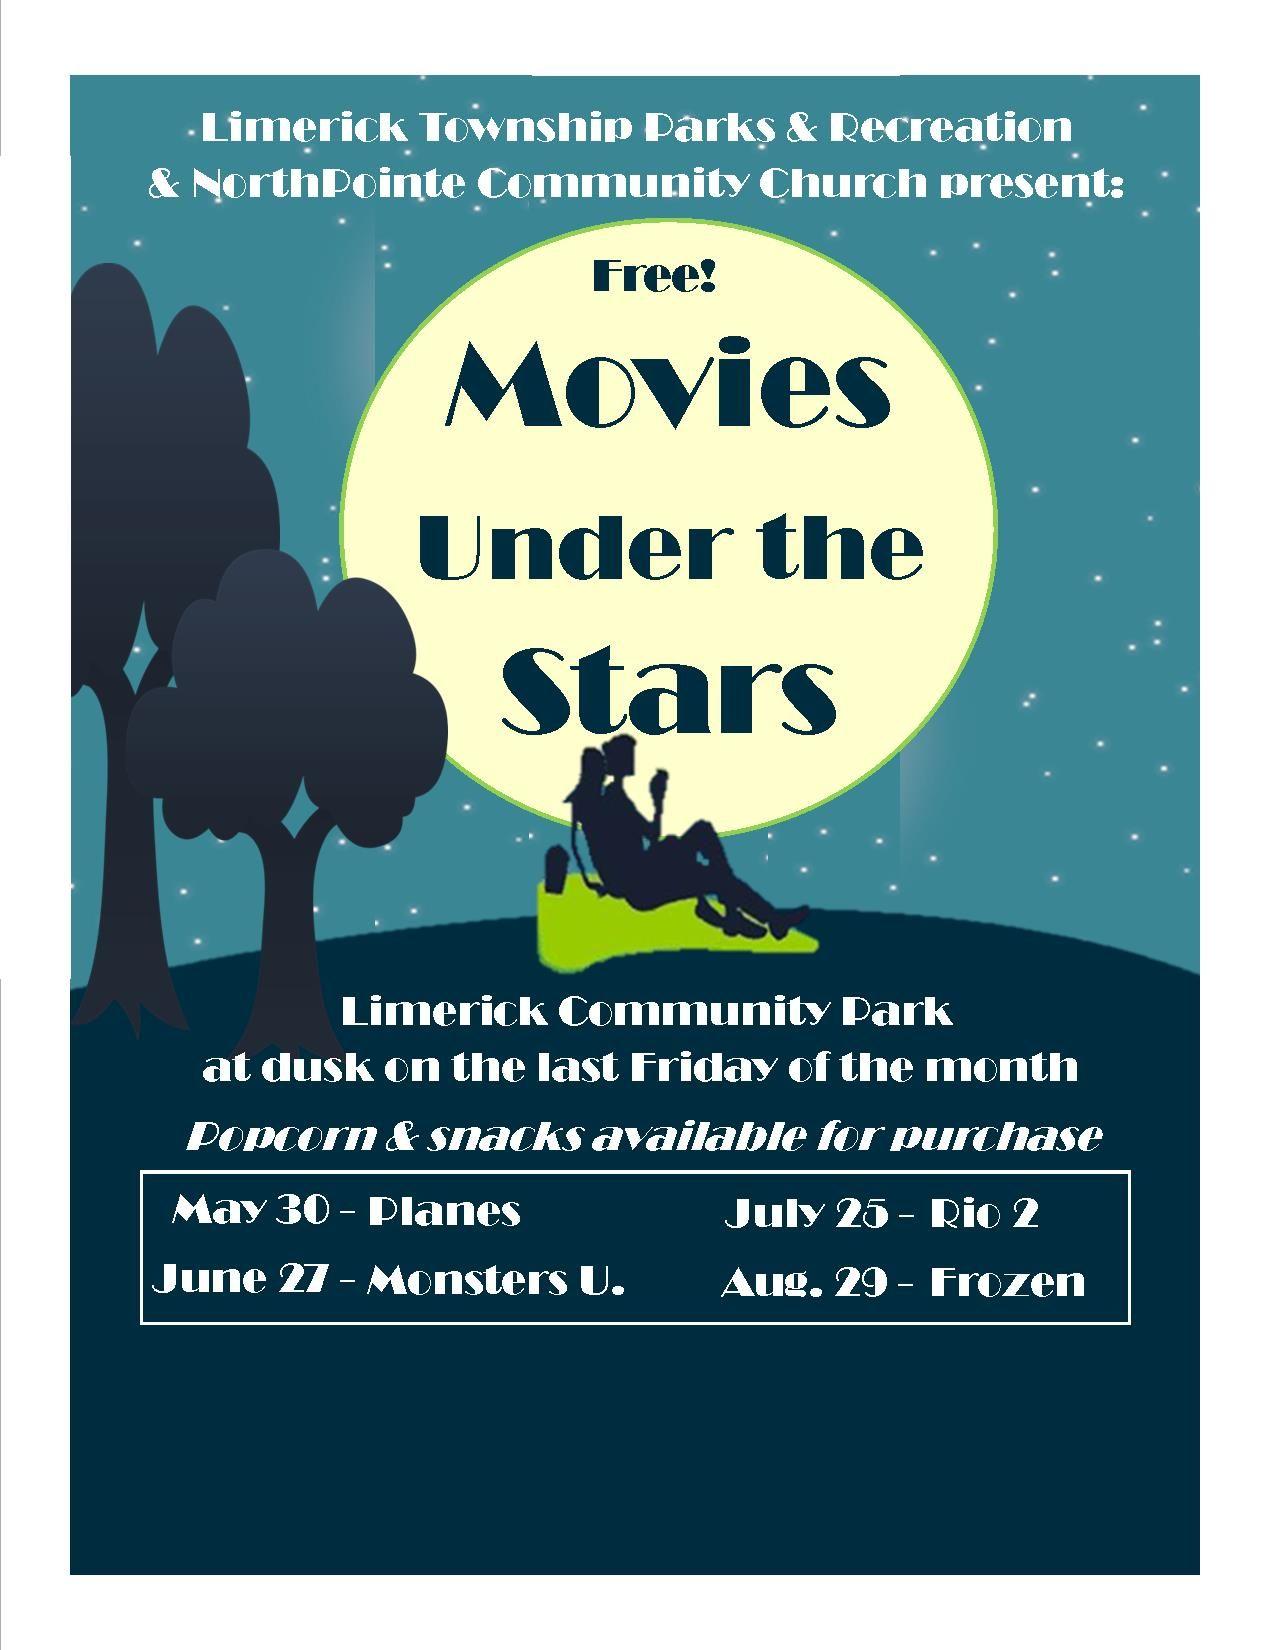 Manderach Park - Limerick. Movies under the stars - Summertime